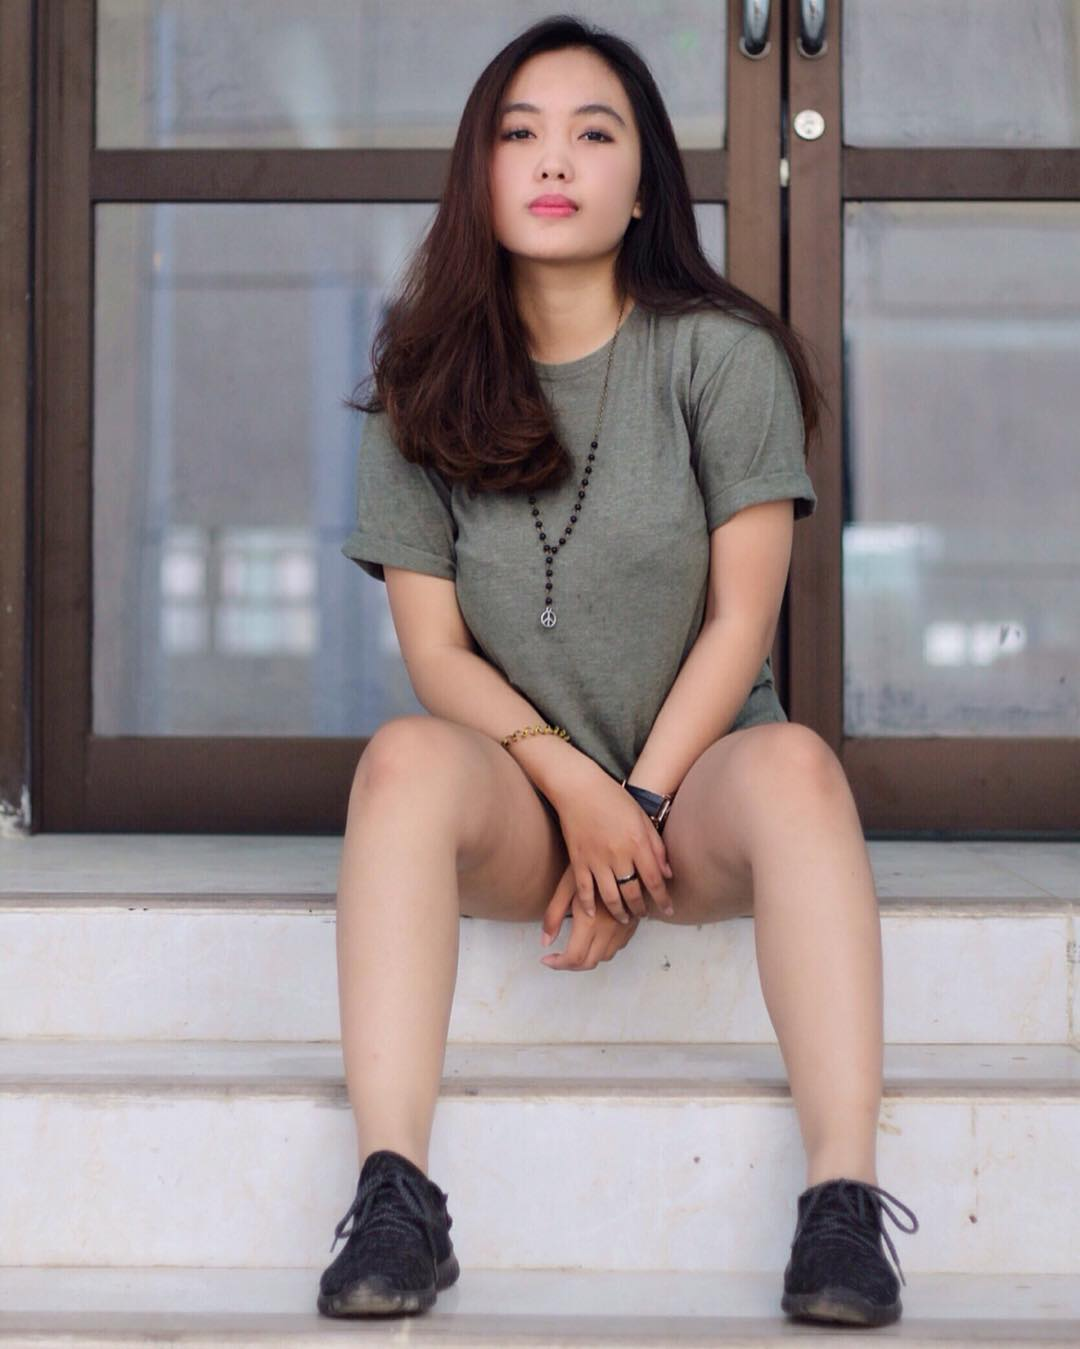 Foto Model Cewek Kaos Distro Bandung Kumpulan Foto Model Distro